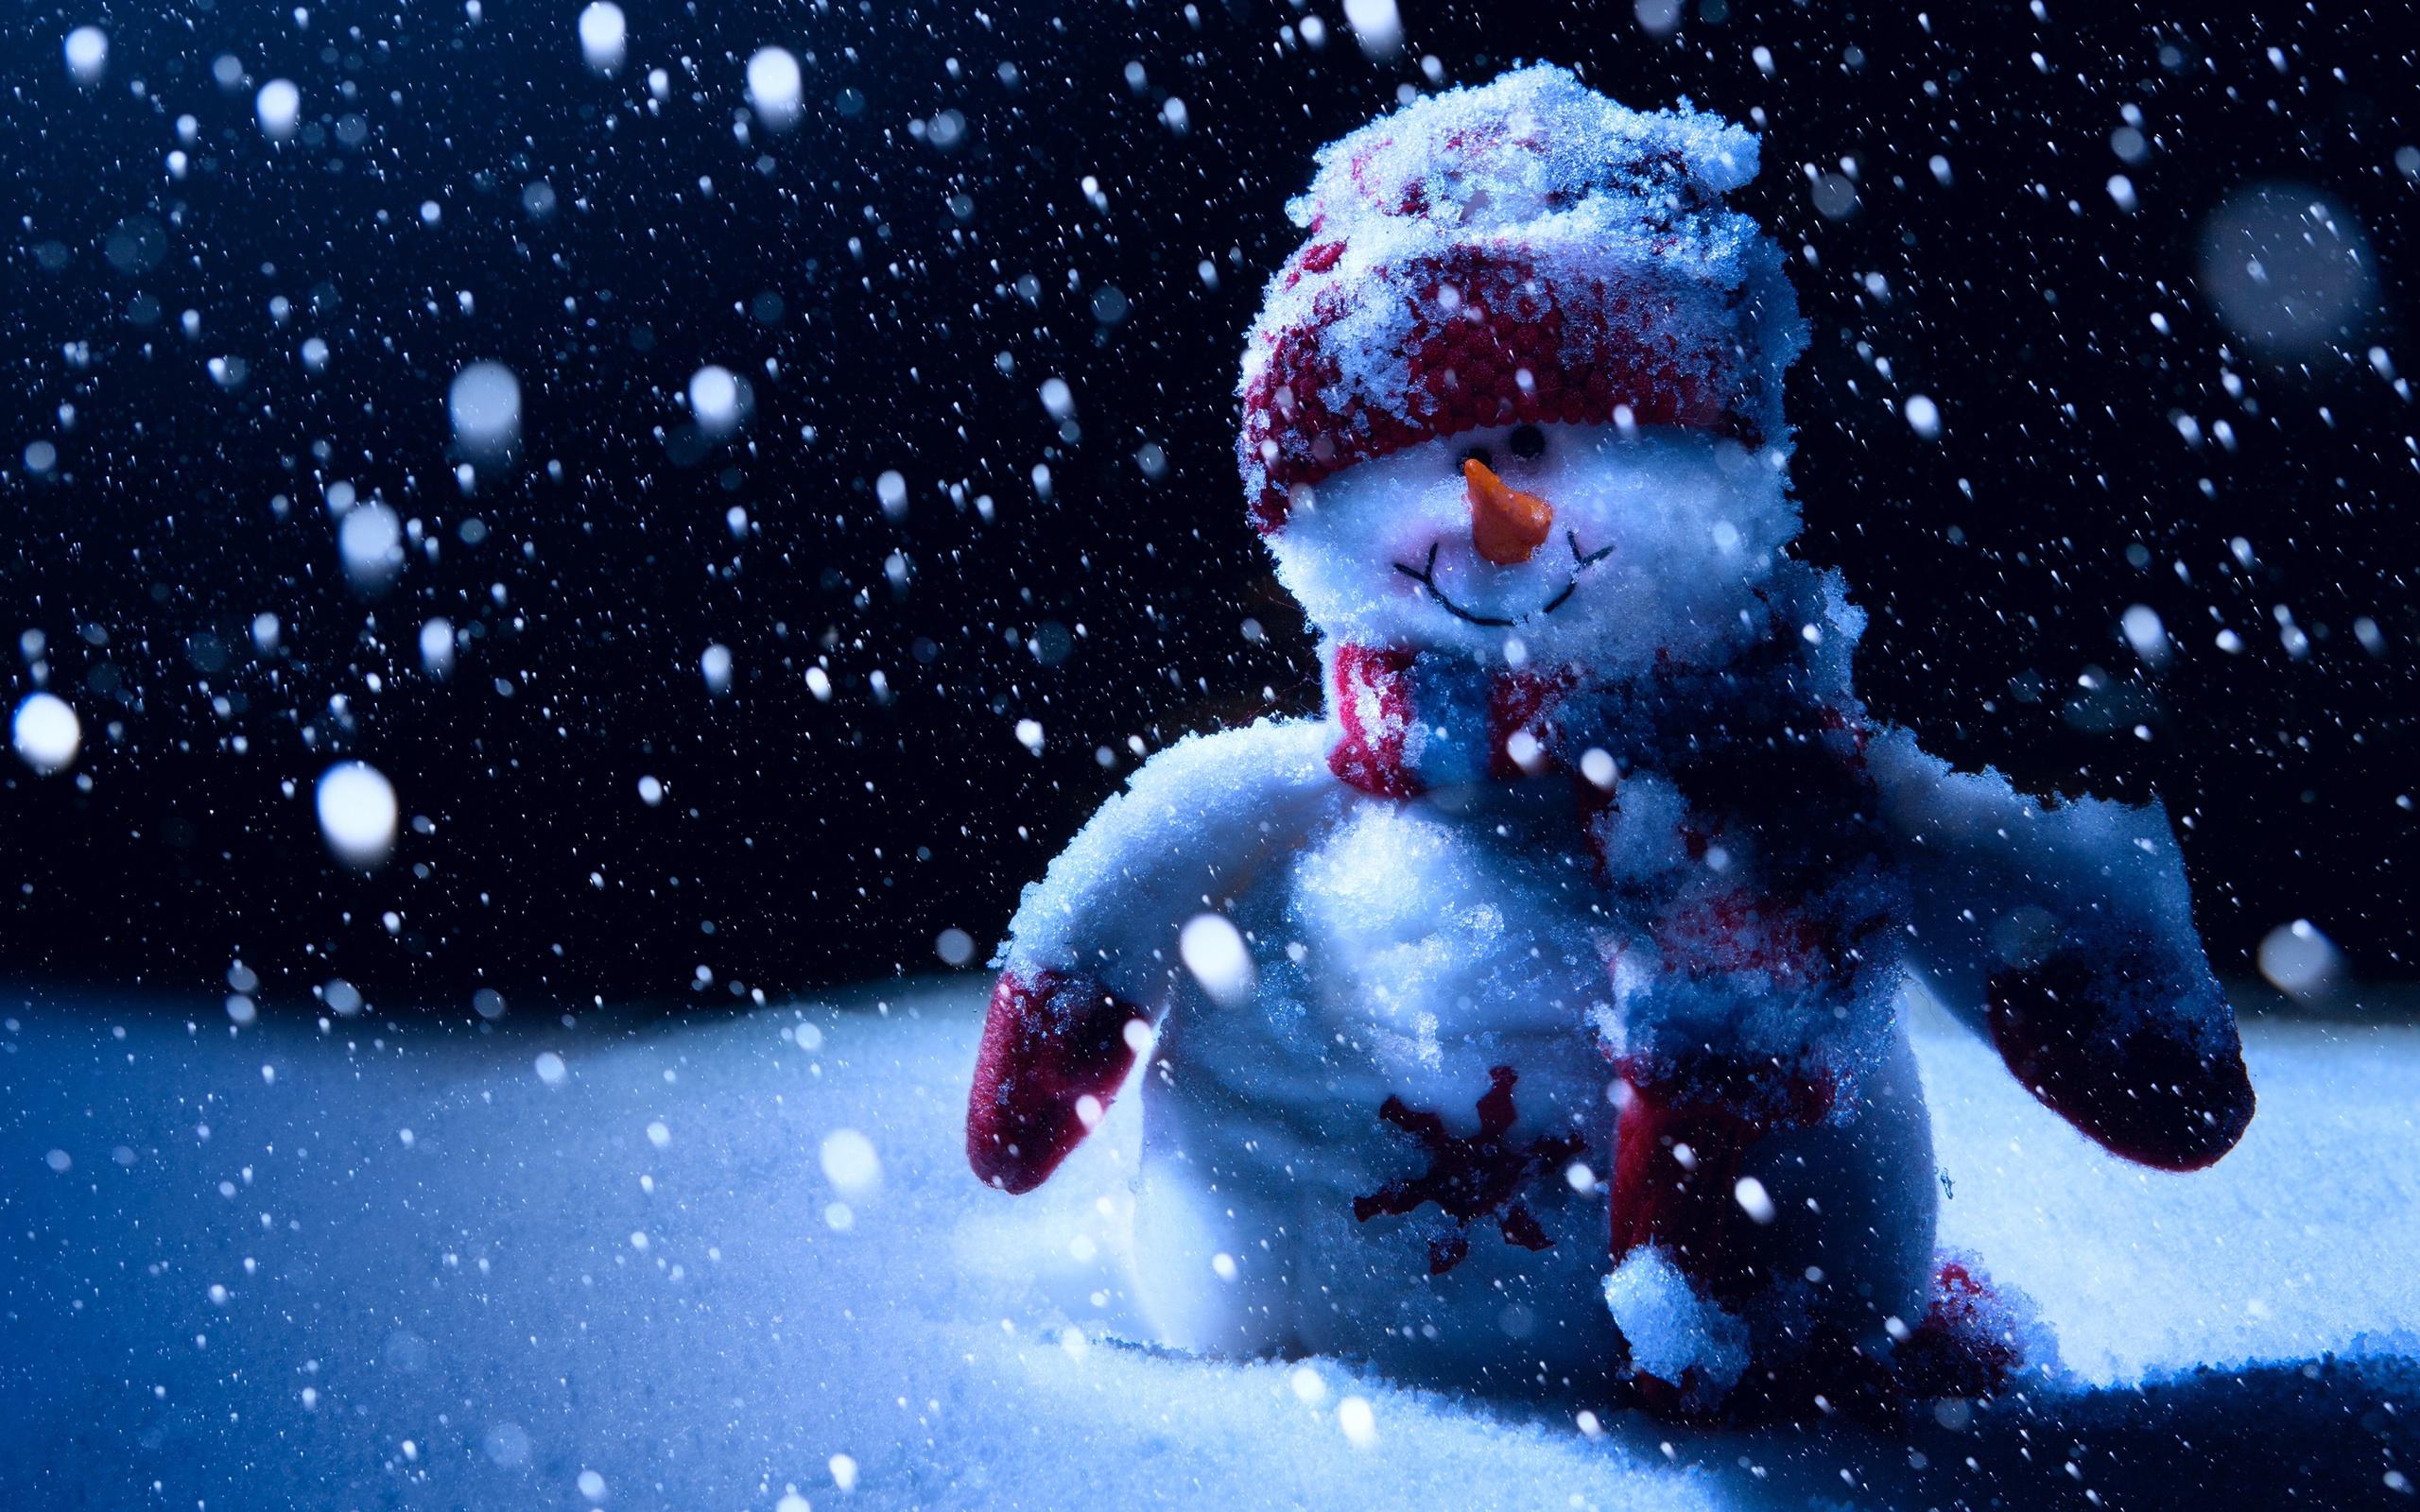 Новый год картинки зима снег